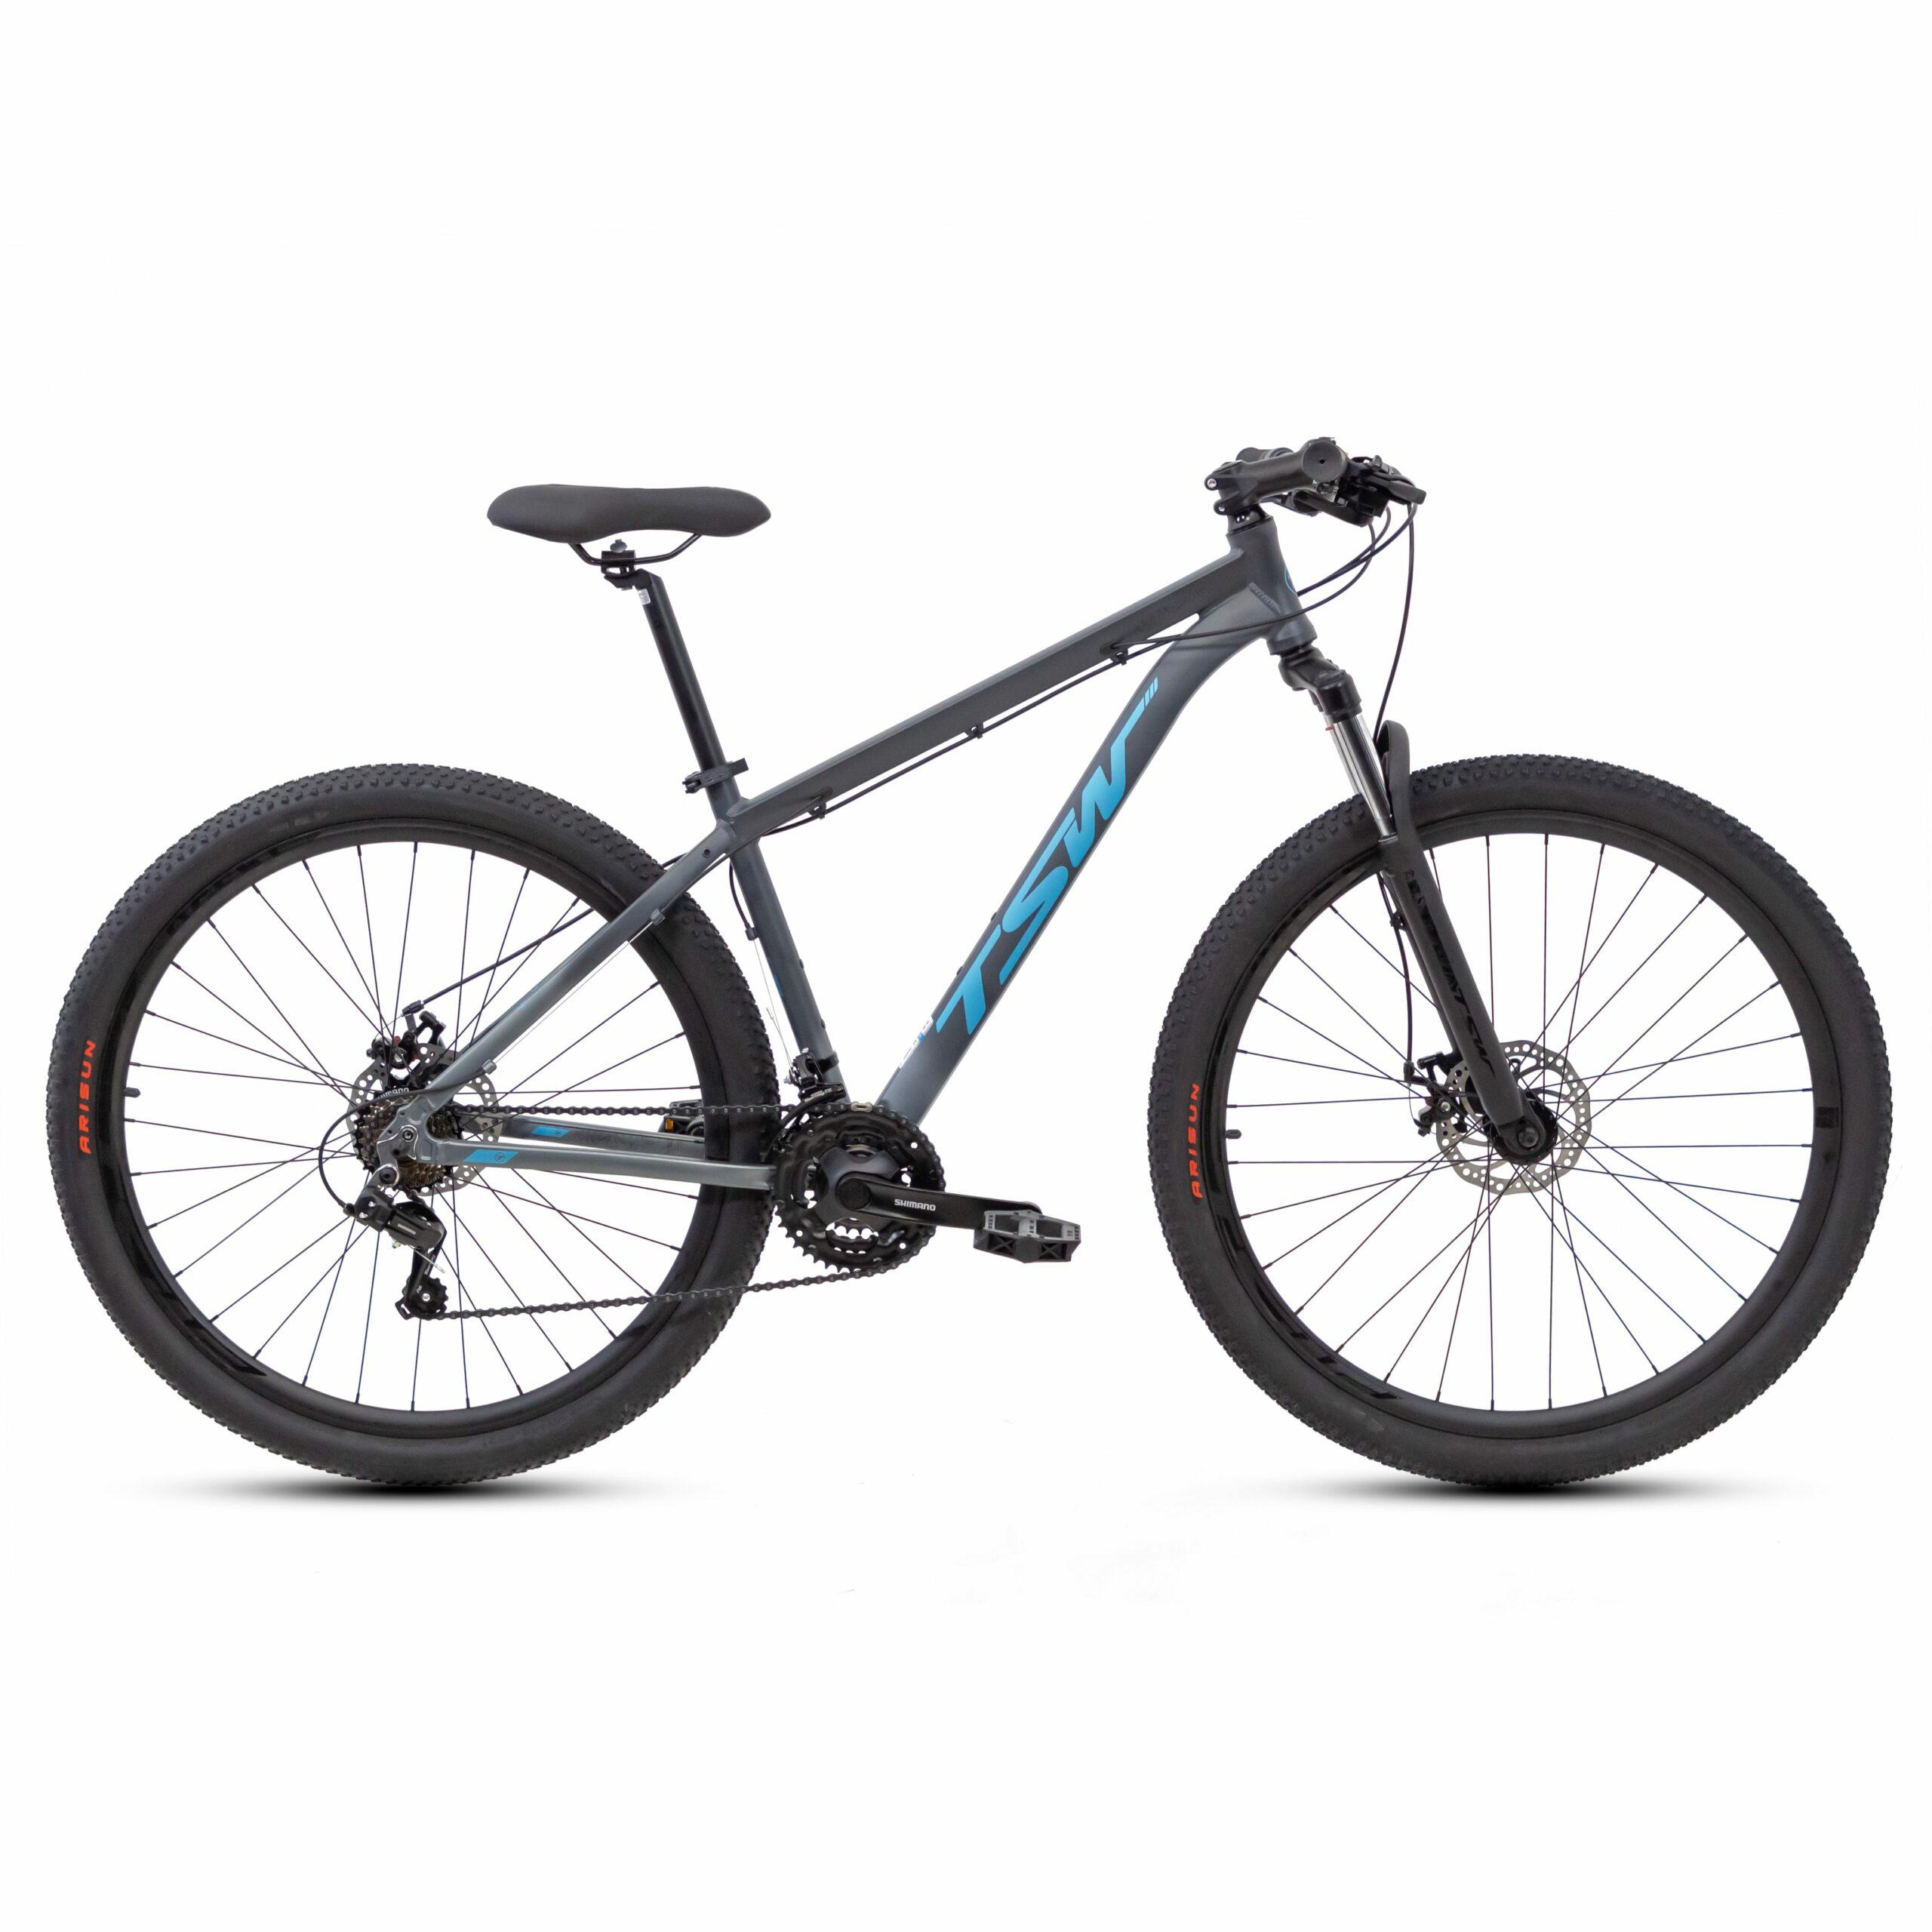 Bicicleta TSW Ride Plus 12